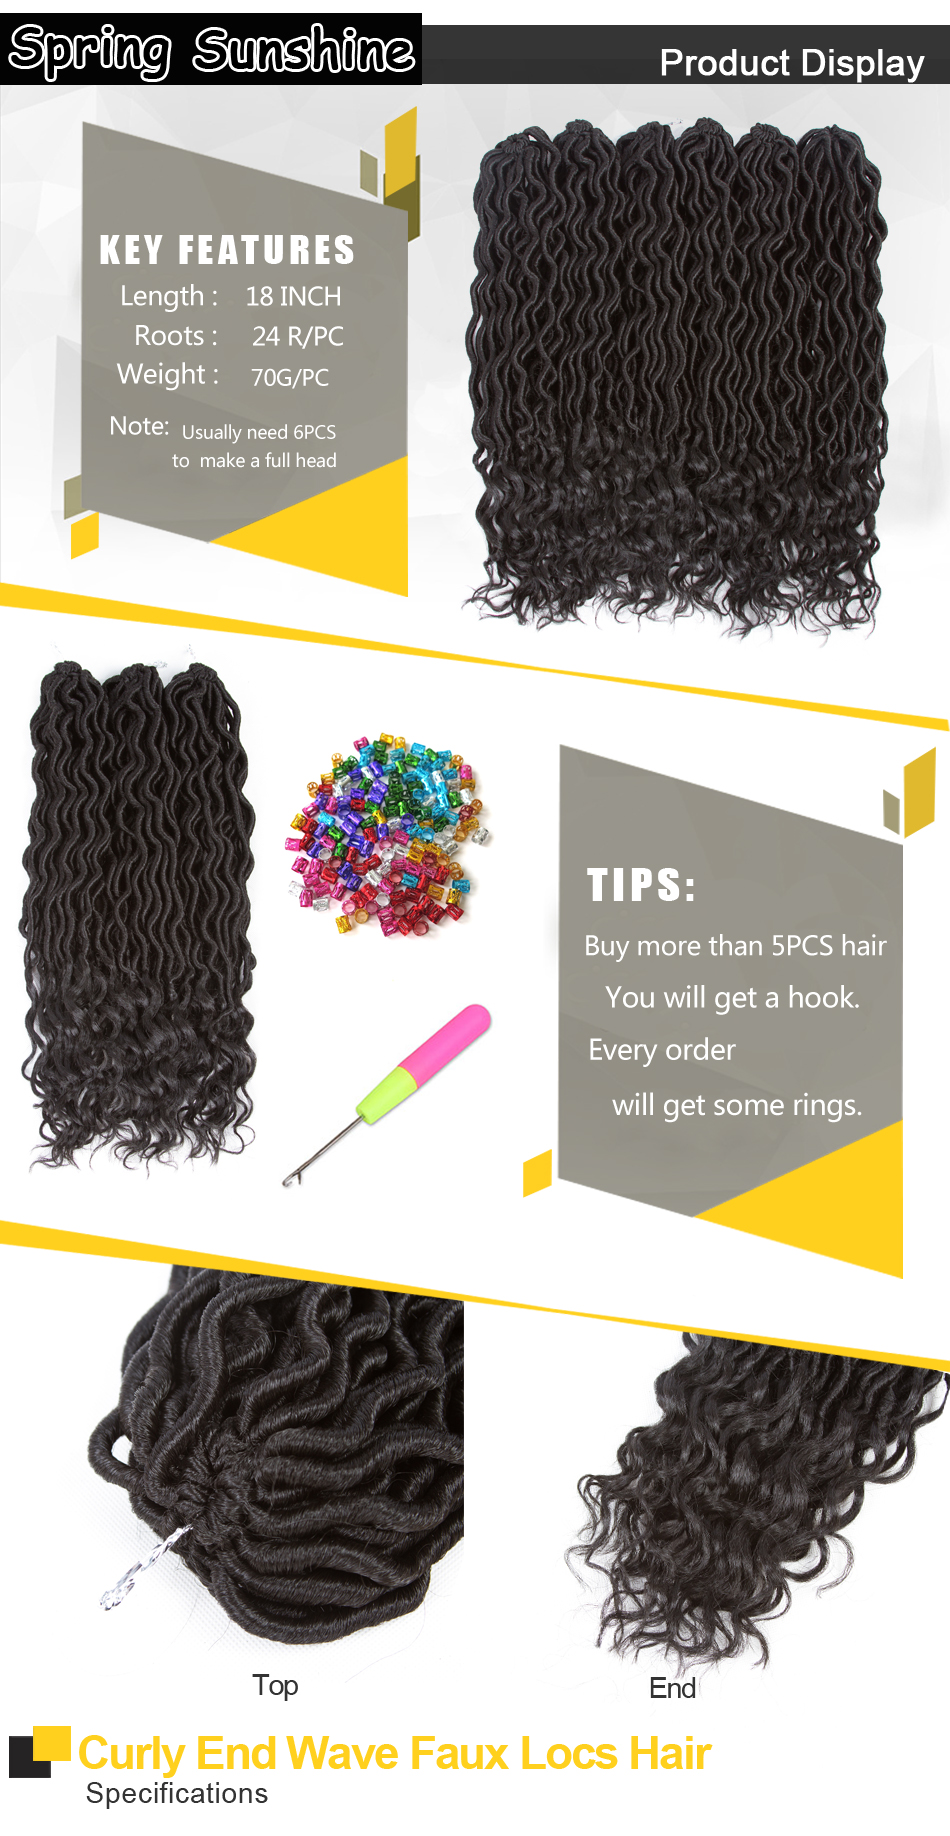 ᐅPrimavera Sol 18 24 soportes Faux LOCs Curly crochet cabello ...